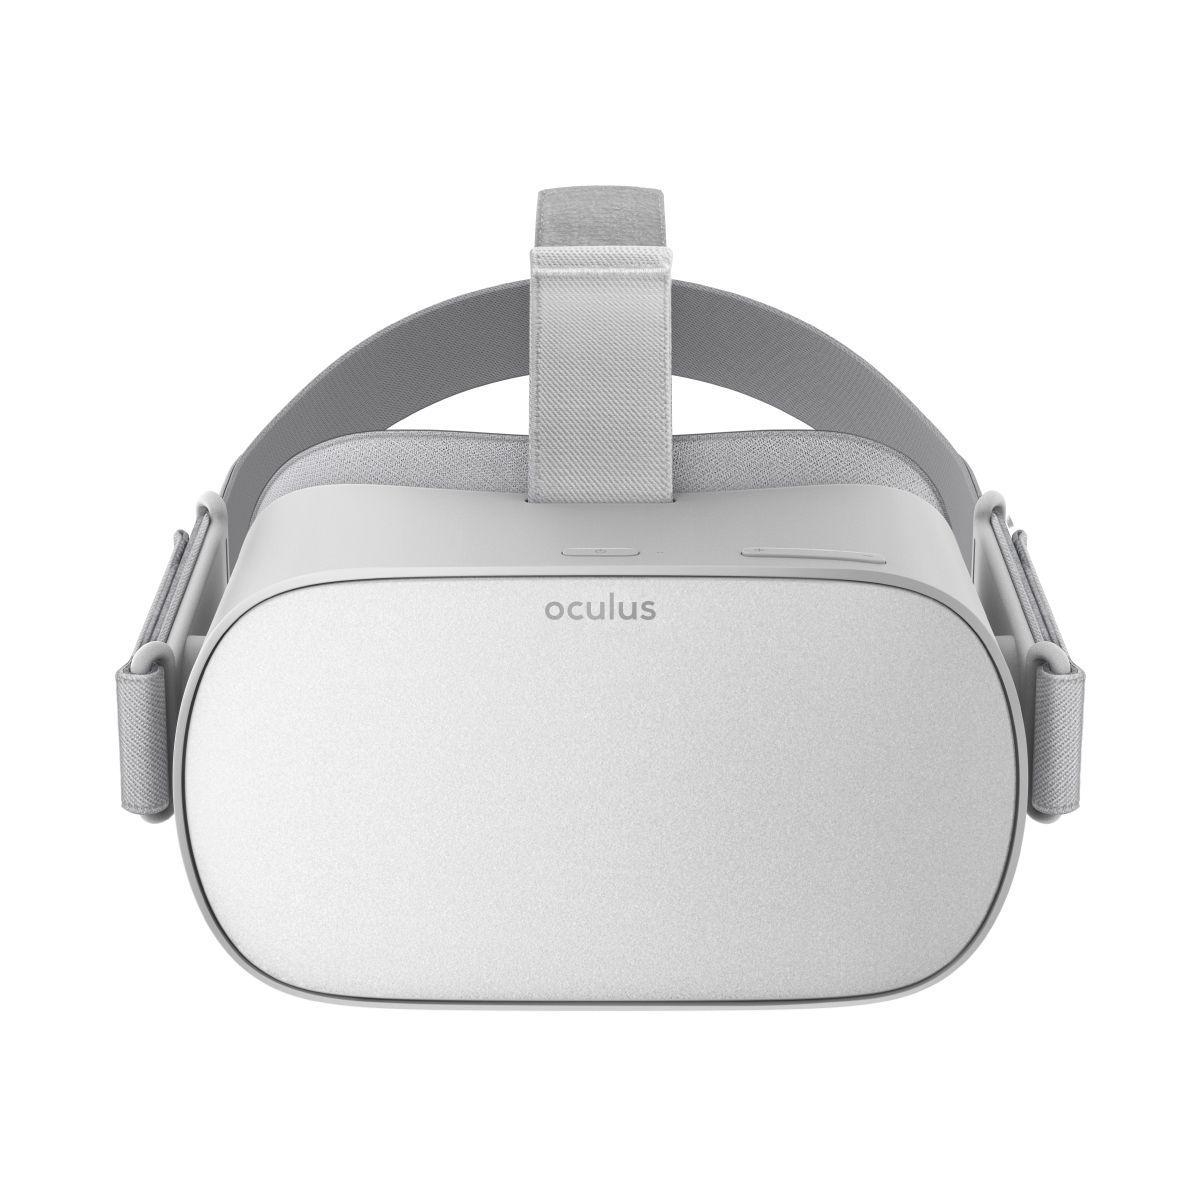 Casque de r�alit� virtuelle oculus go 64gb (photo)